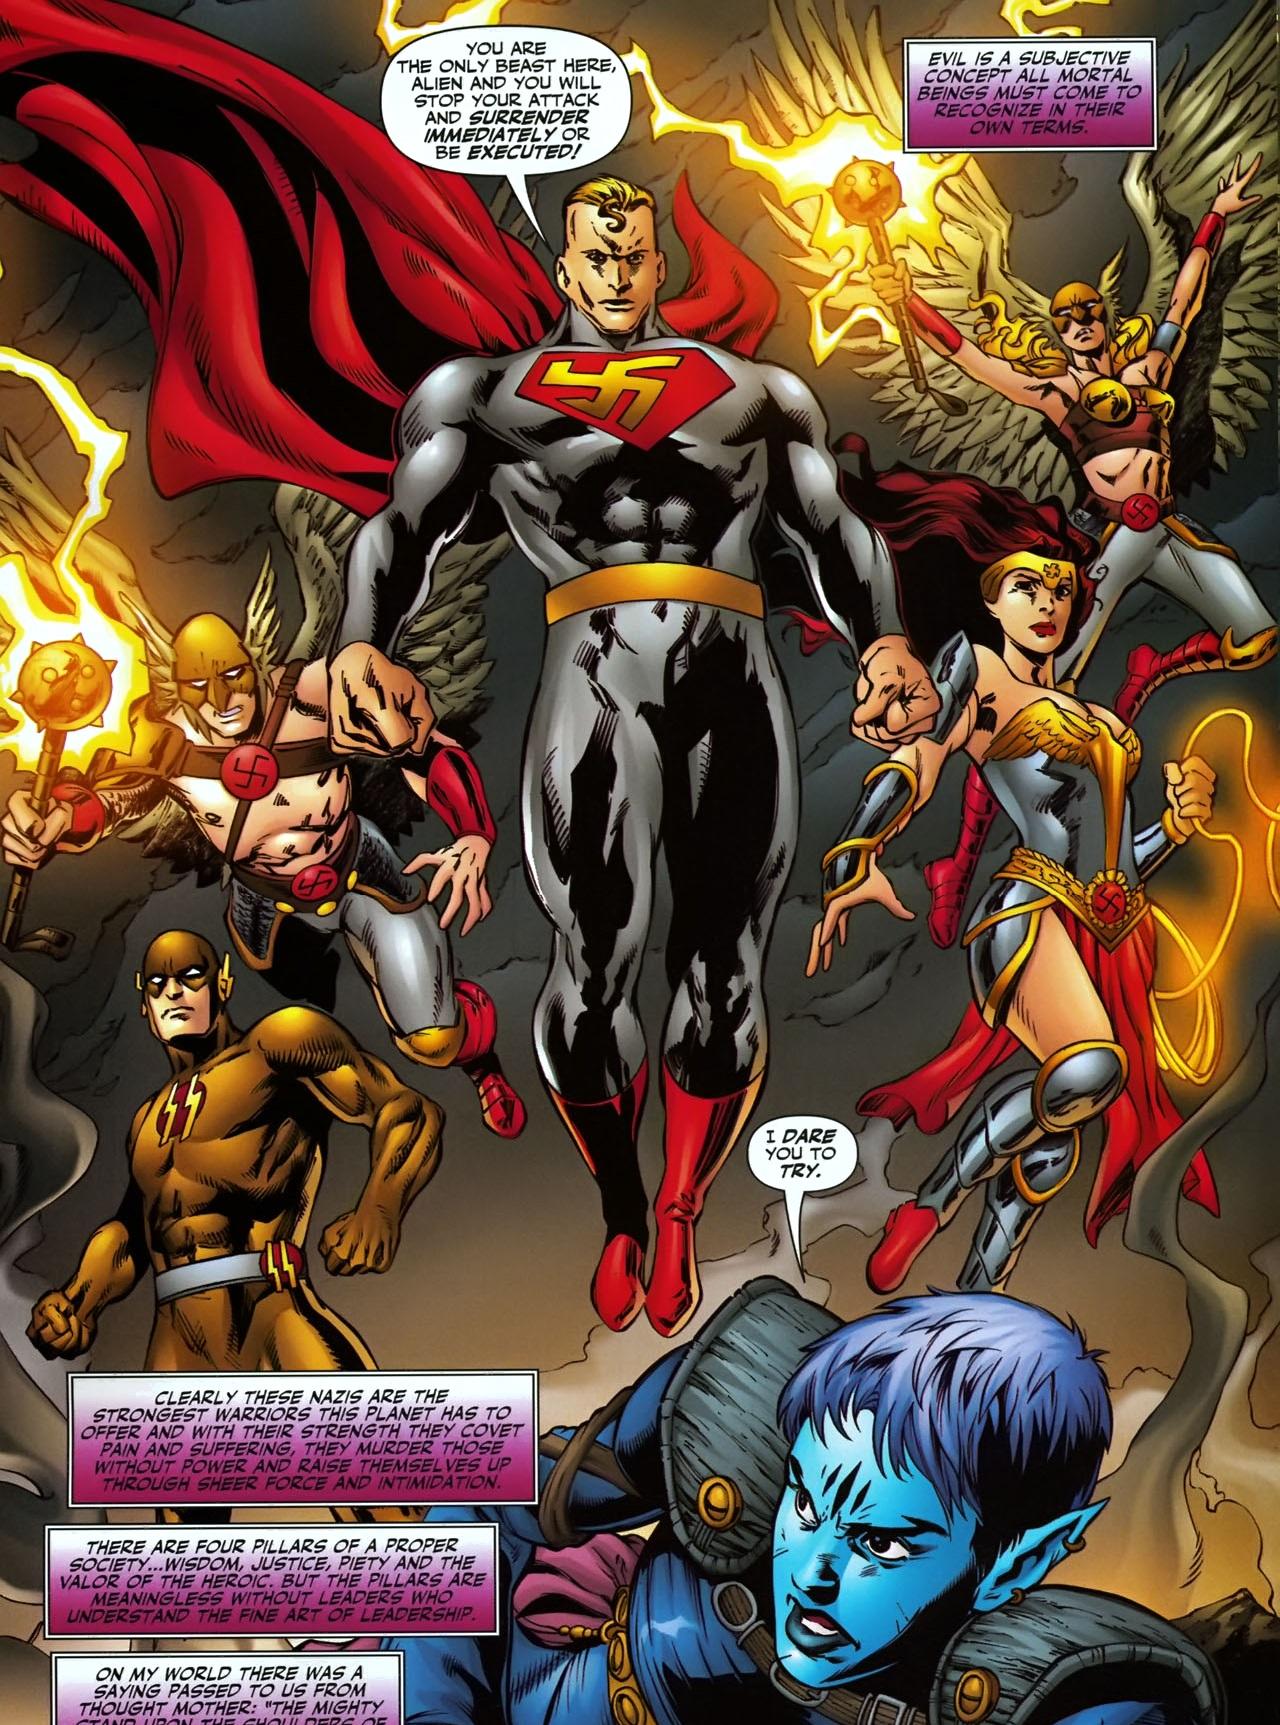 Jl vs doomsday the fall of the kryptonian - 3 8